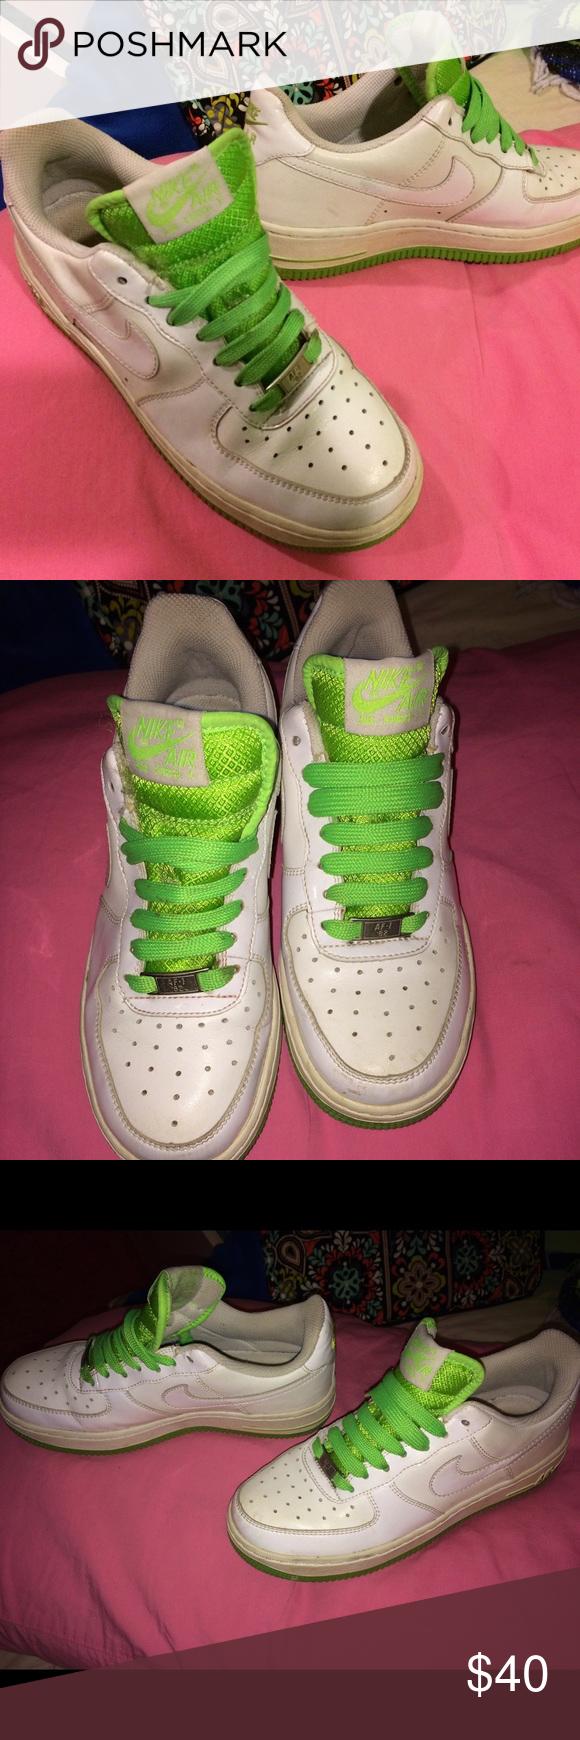 Nike, Nike air force, Sneakers